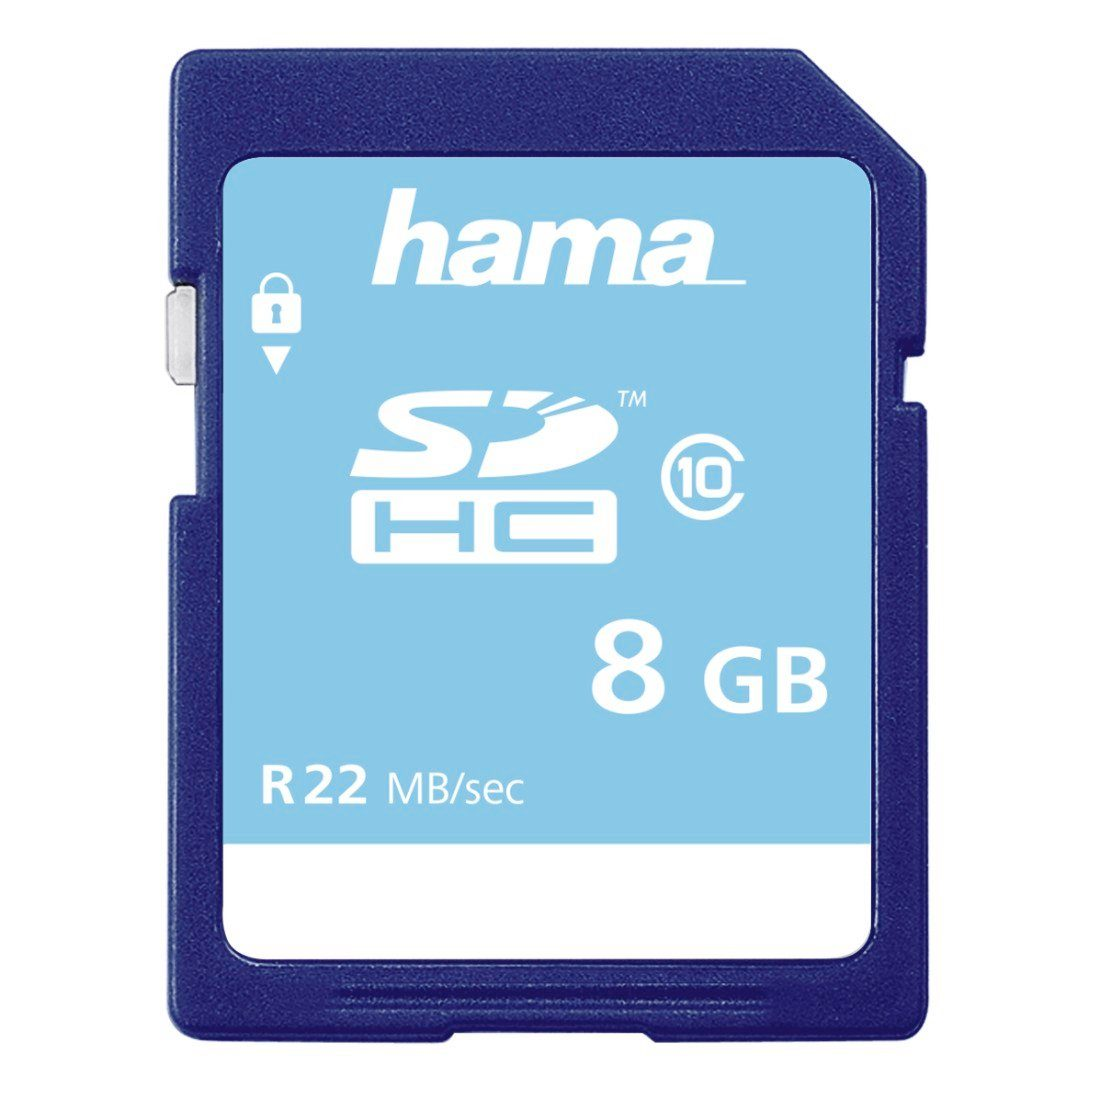 Hama Speicherkarte SDHC 8GB Class 10 »für Full-HD Videos geeignet«